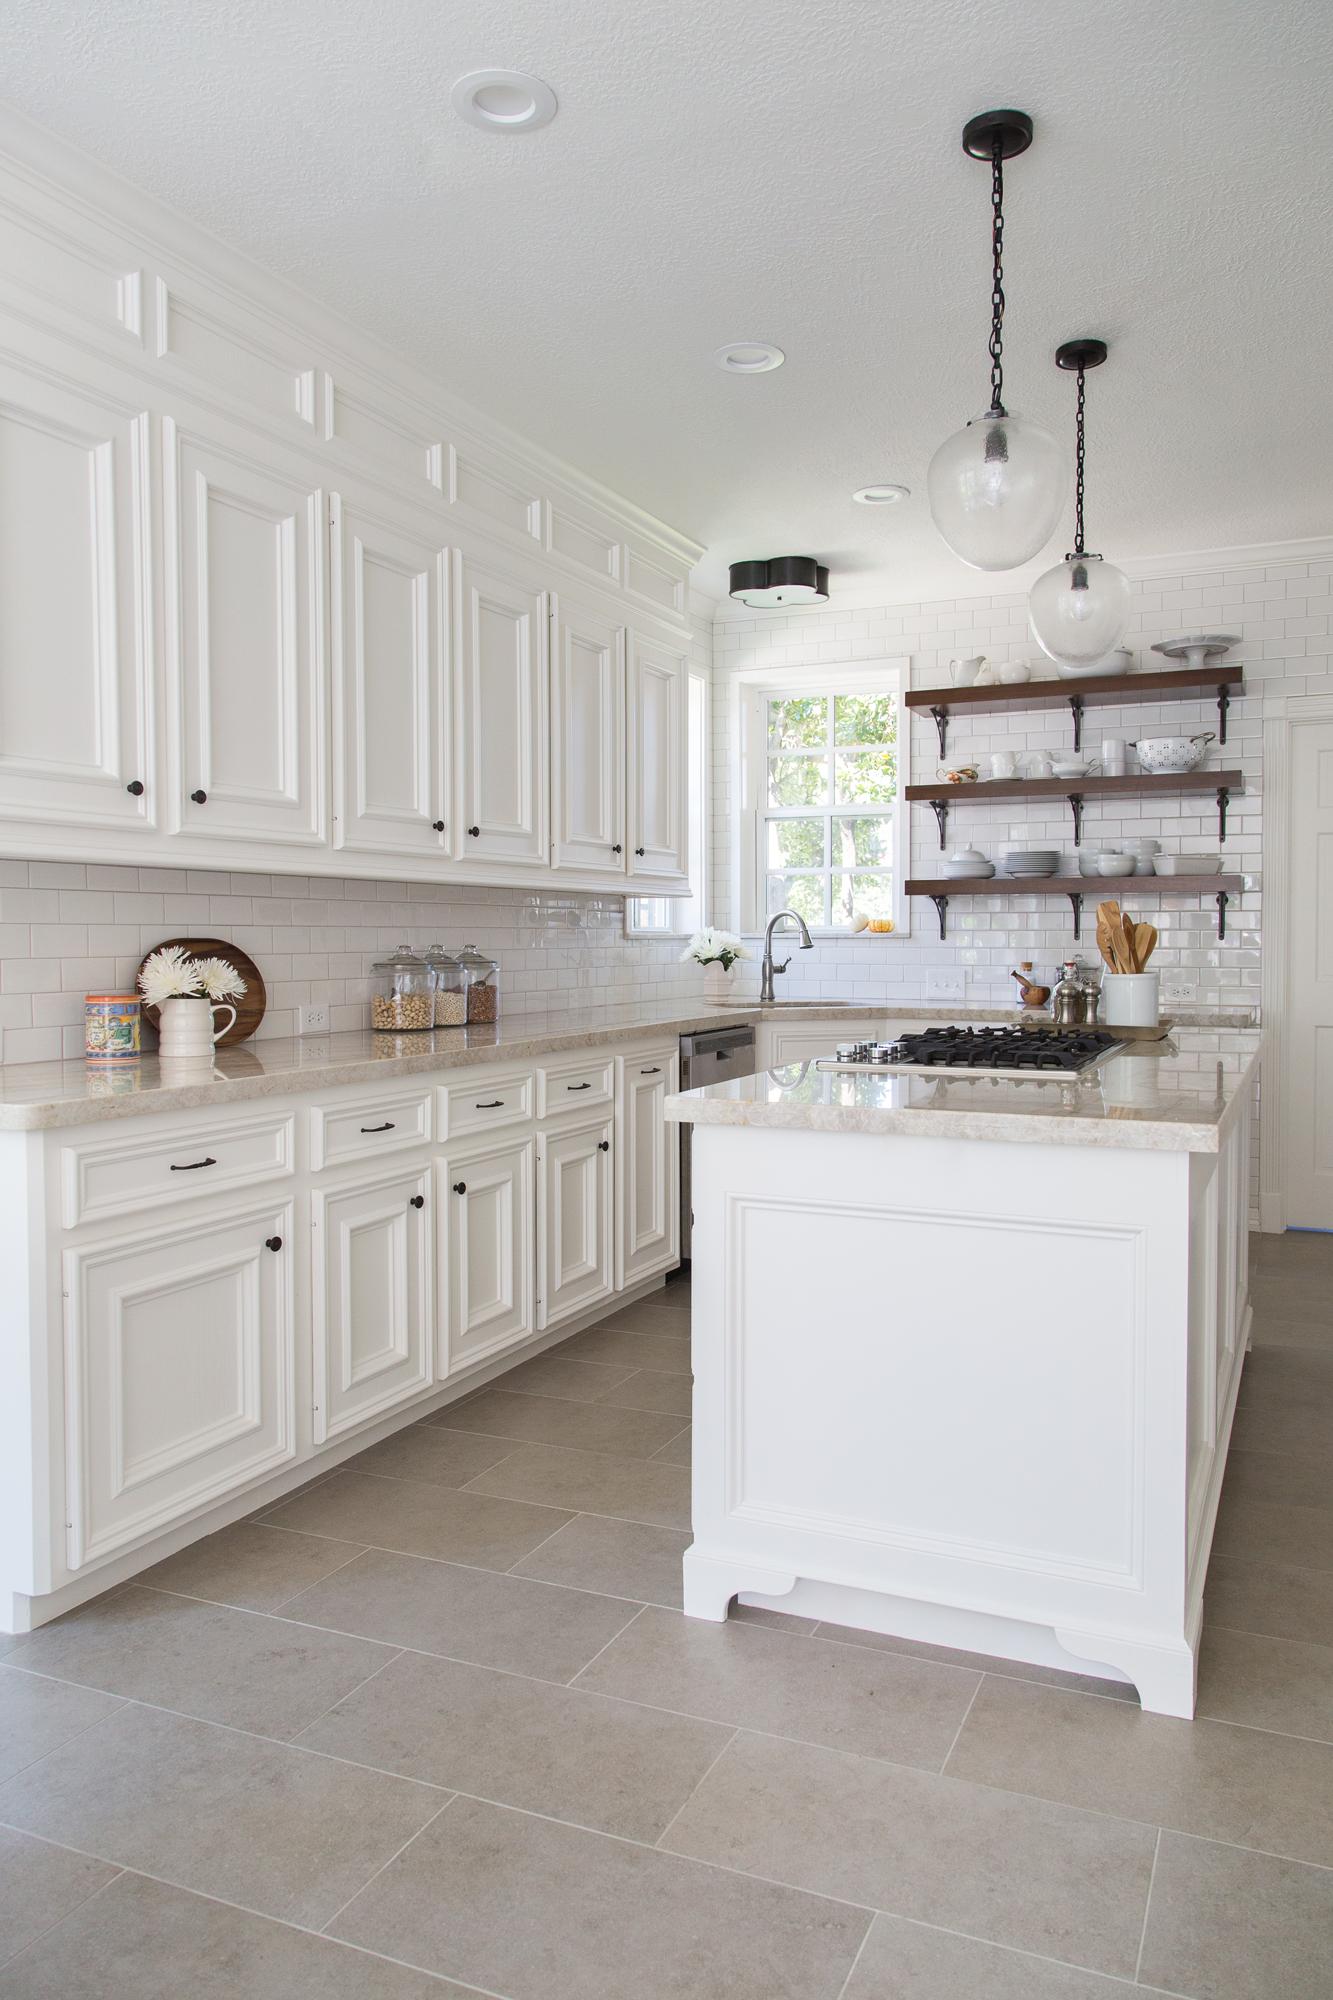 White kitchen remodel with open wood shelves - Designer: Carla Aston, Photographer: Tori Aston #whitekitchen #openshelving #quartzitecountertops